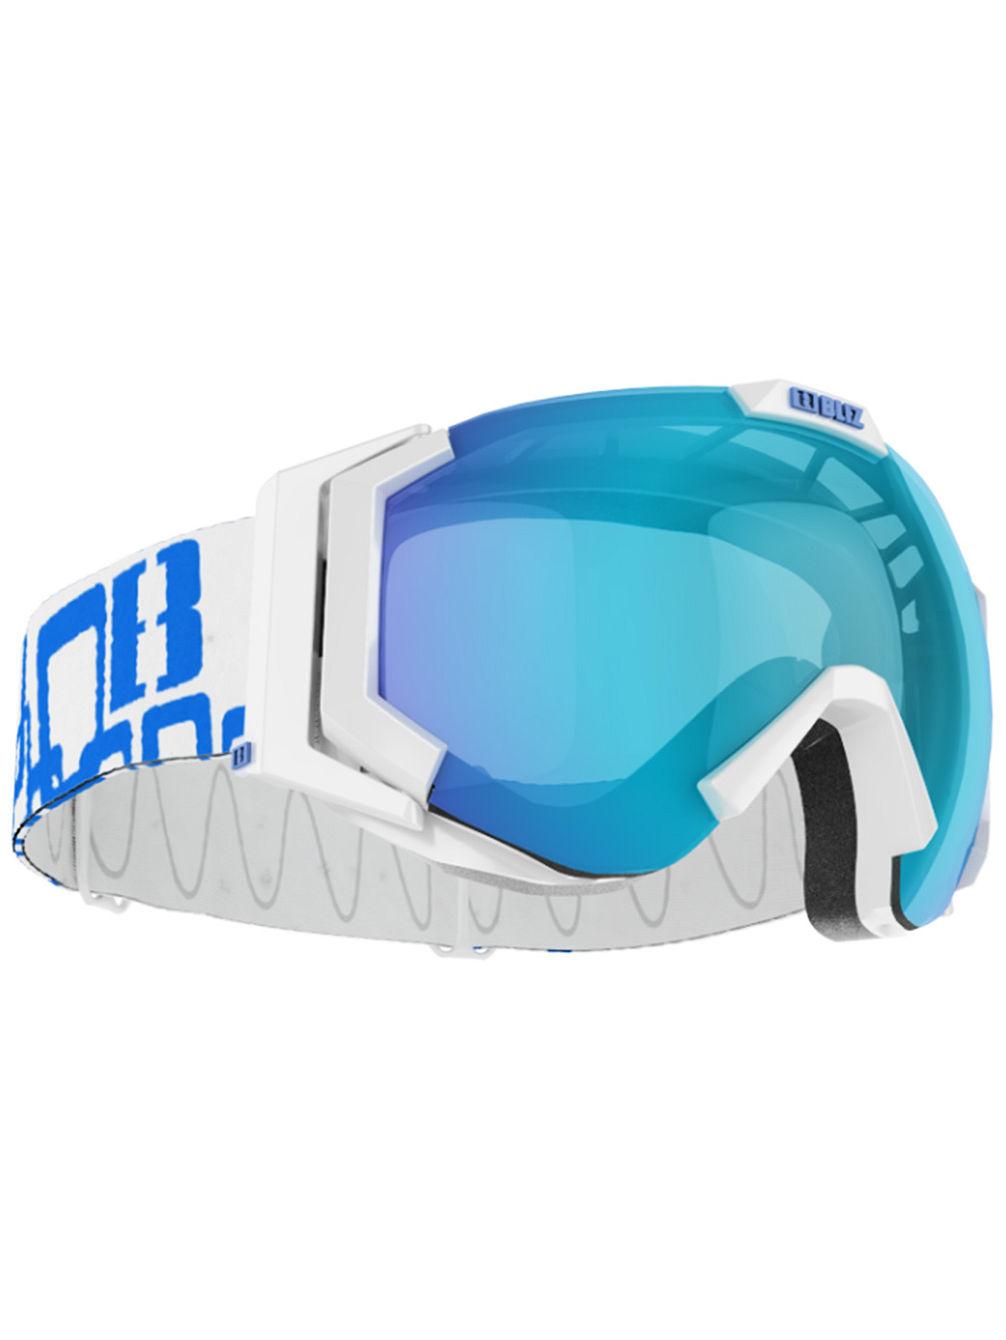 bliz-protective-sports-gear-carver-smallface-matt-white